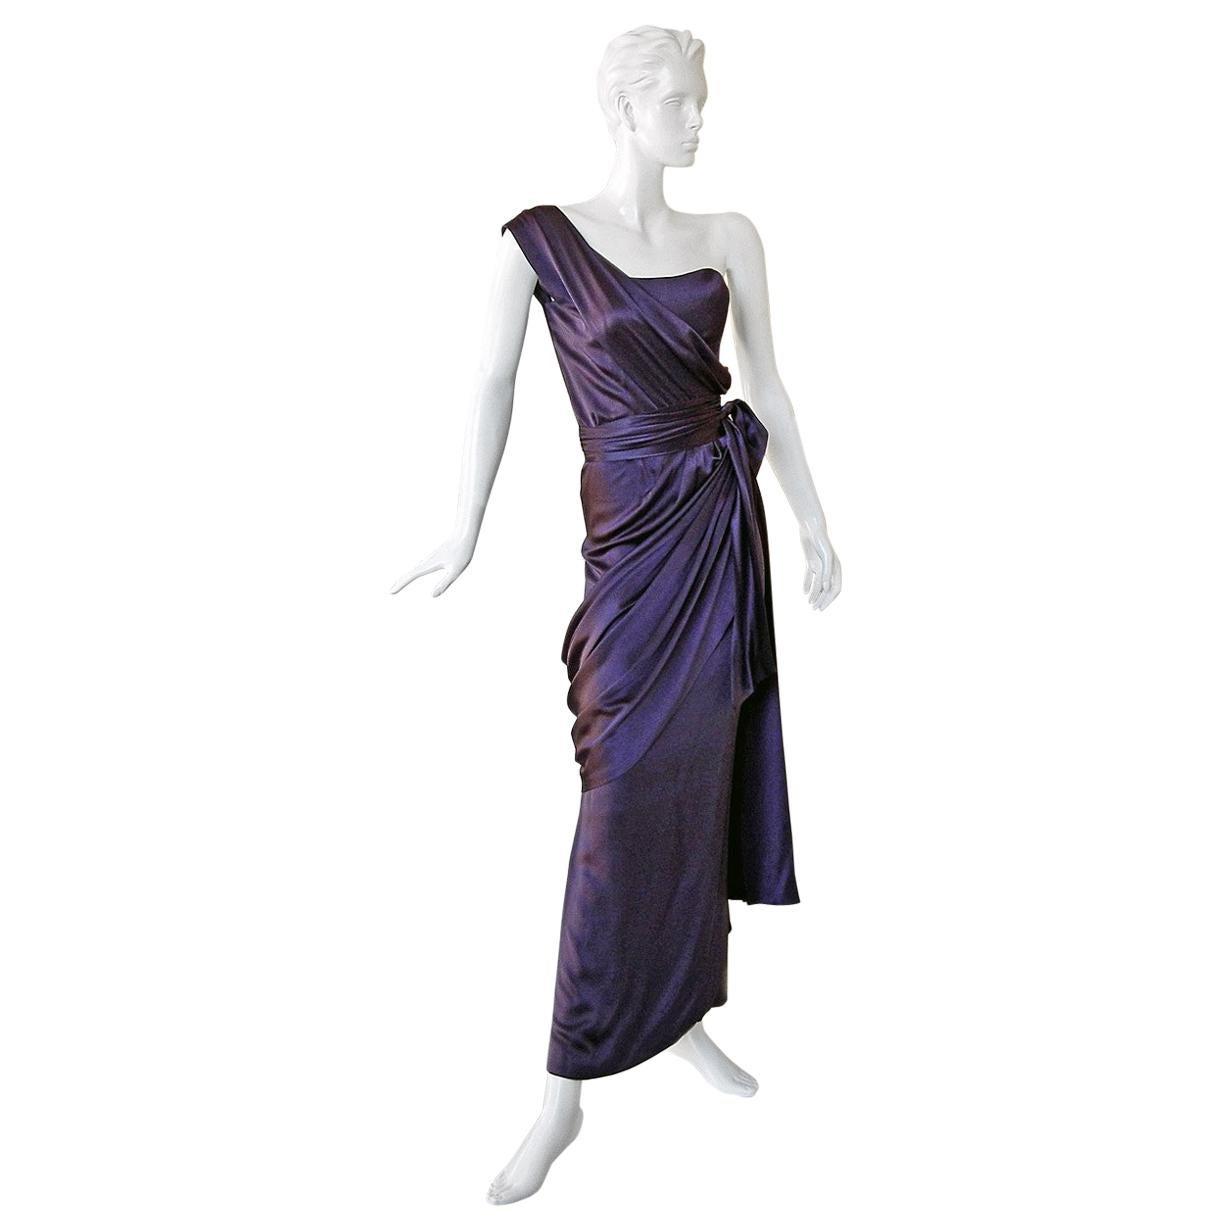 Yves Saint Laurent Haute Couture Grecian Drape Runway Gown